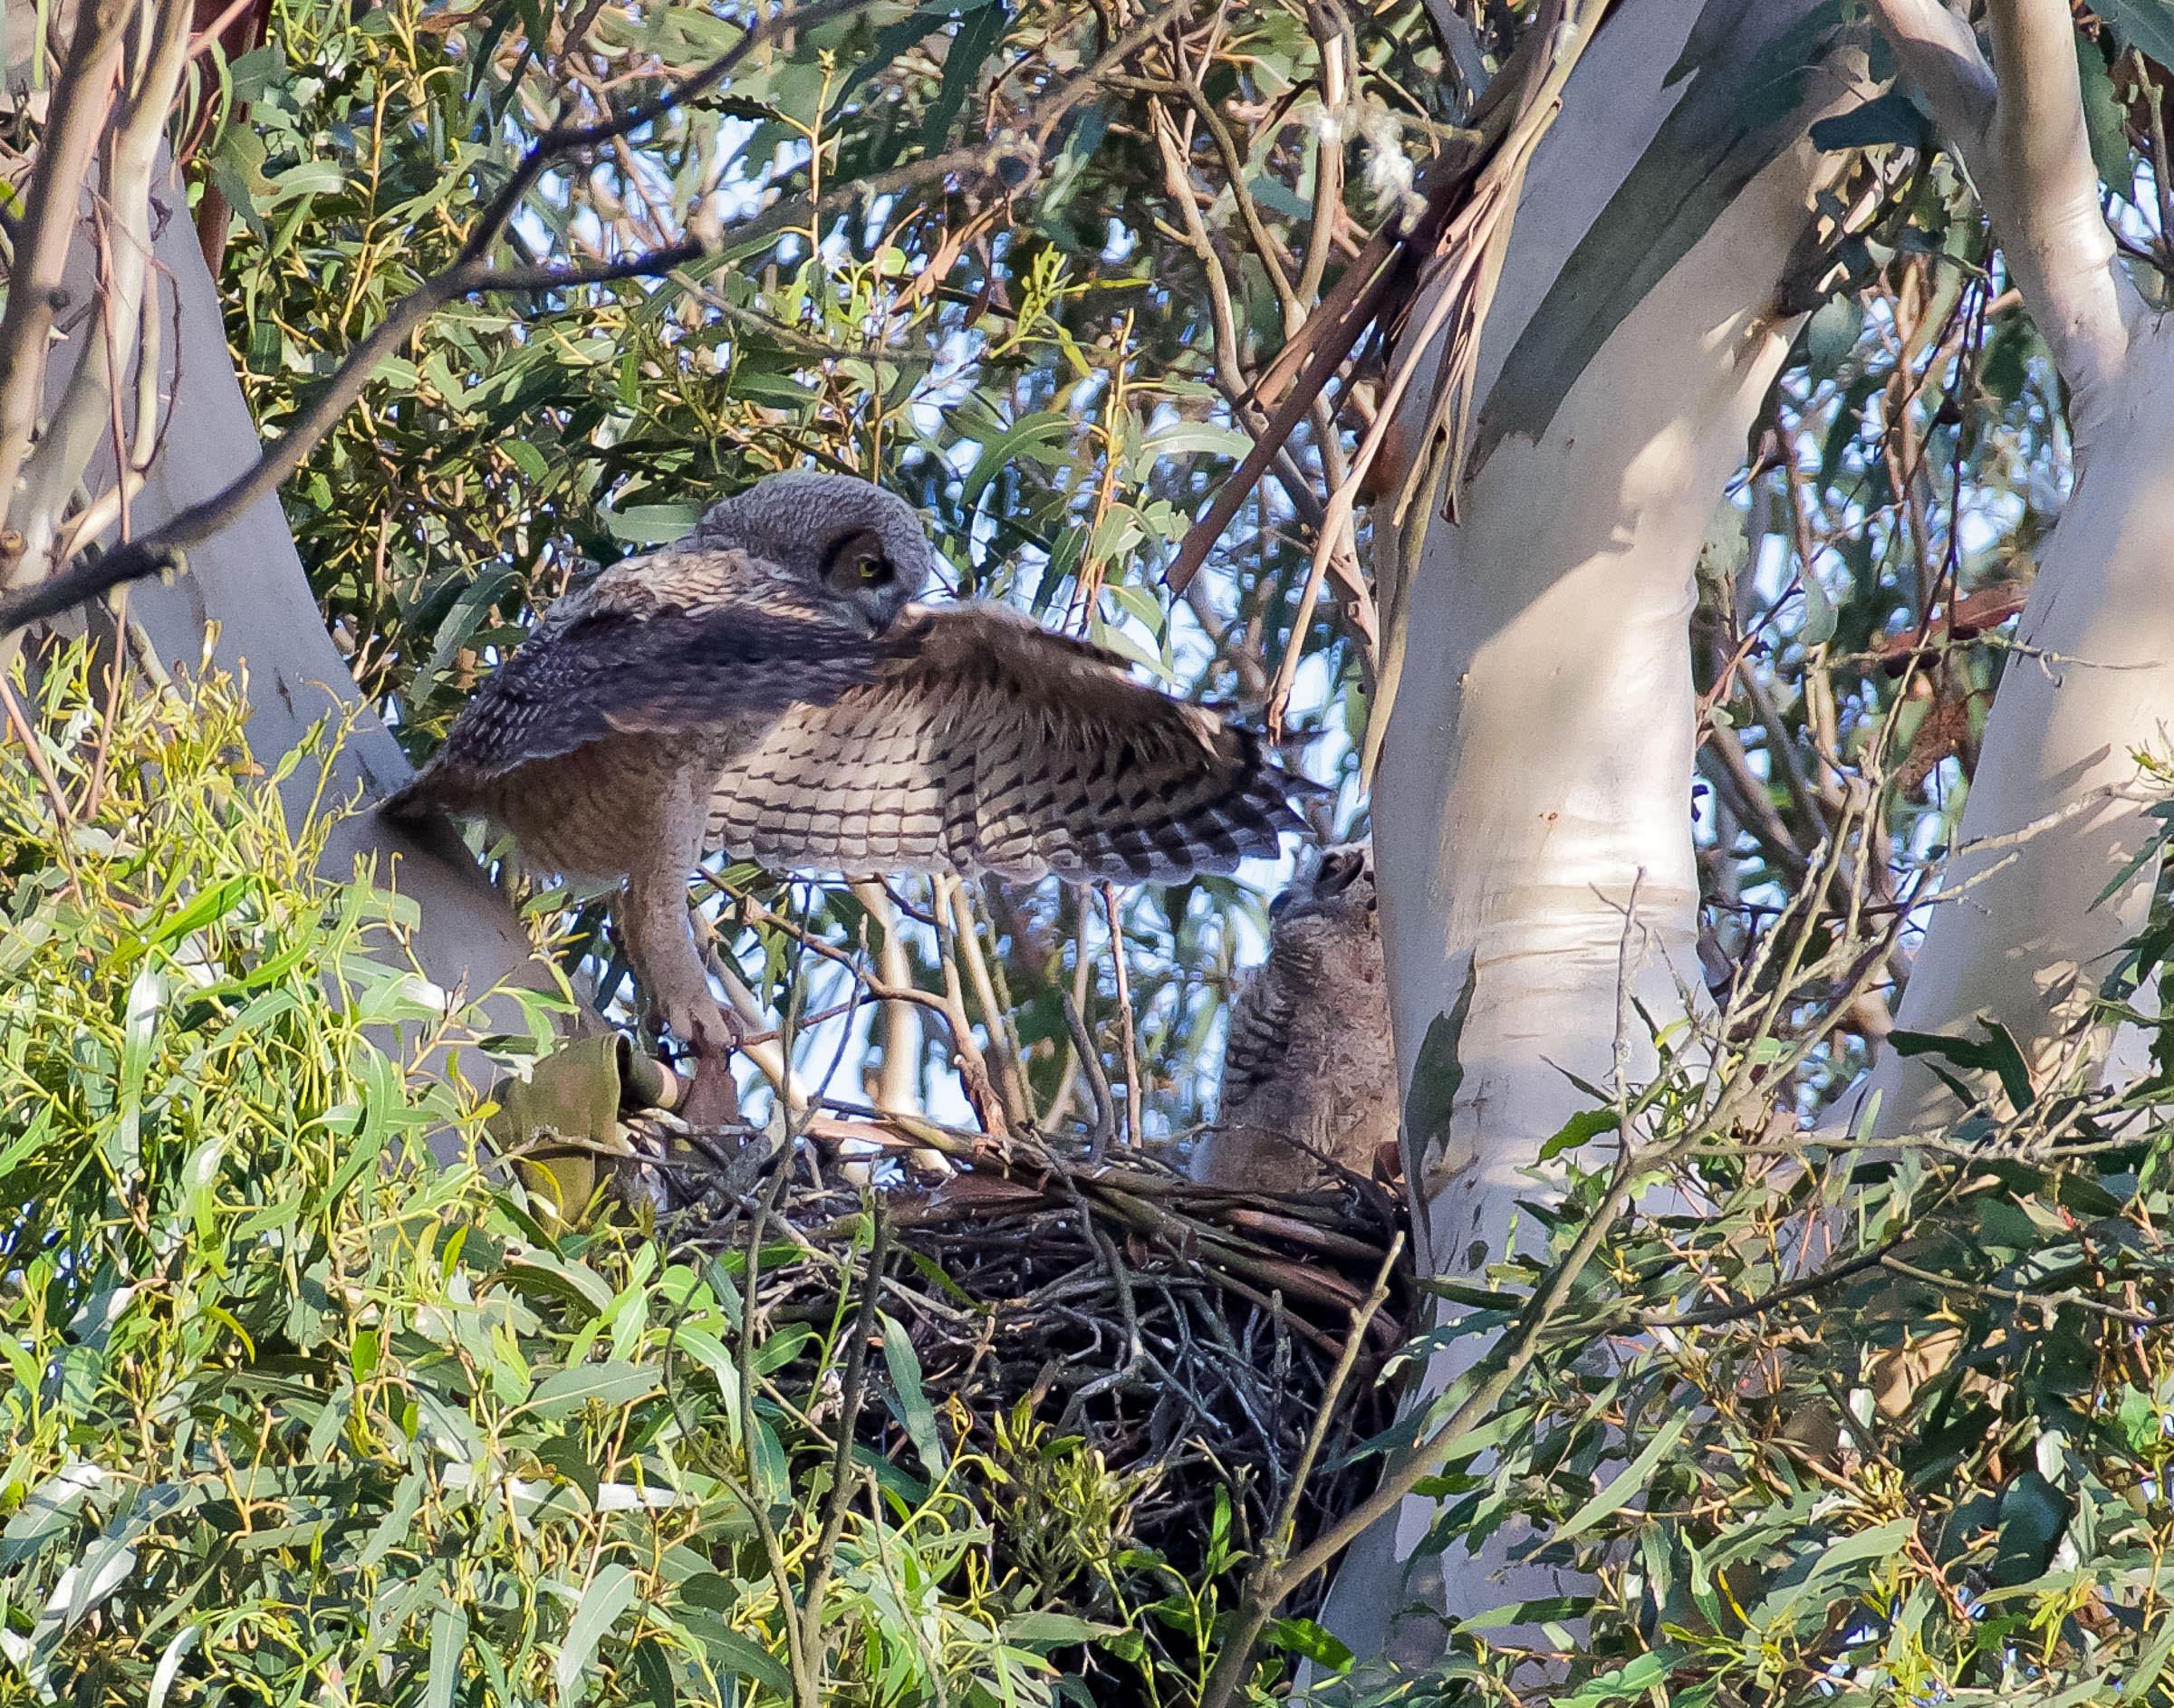 great_horned_owlets_fly_nest_book3-1.jpg